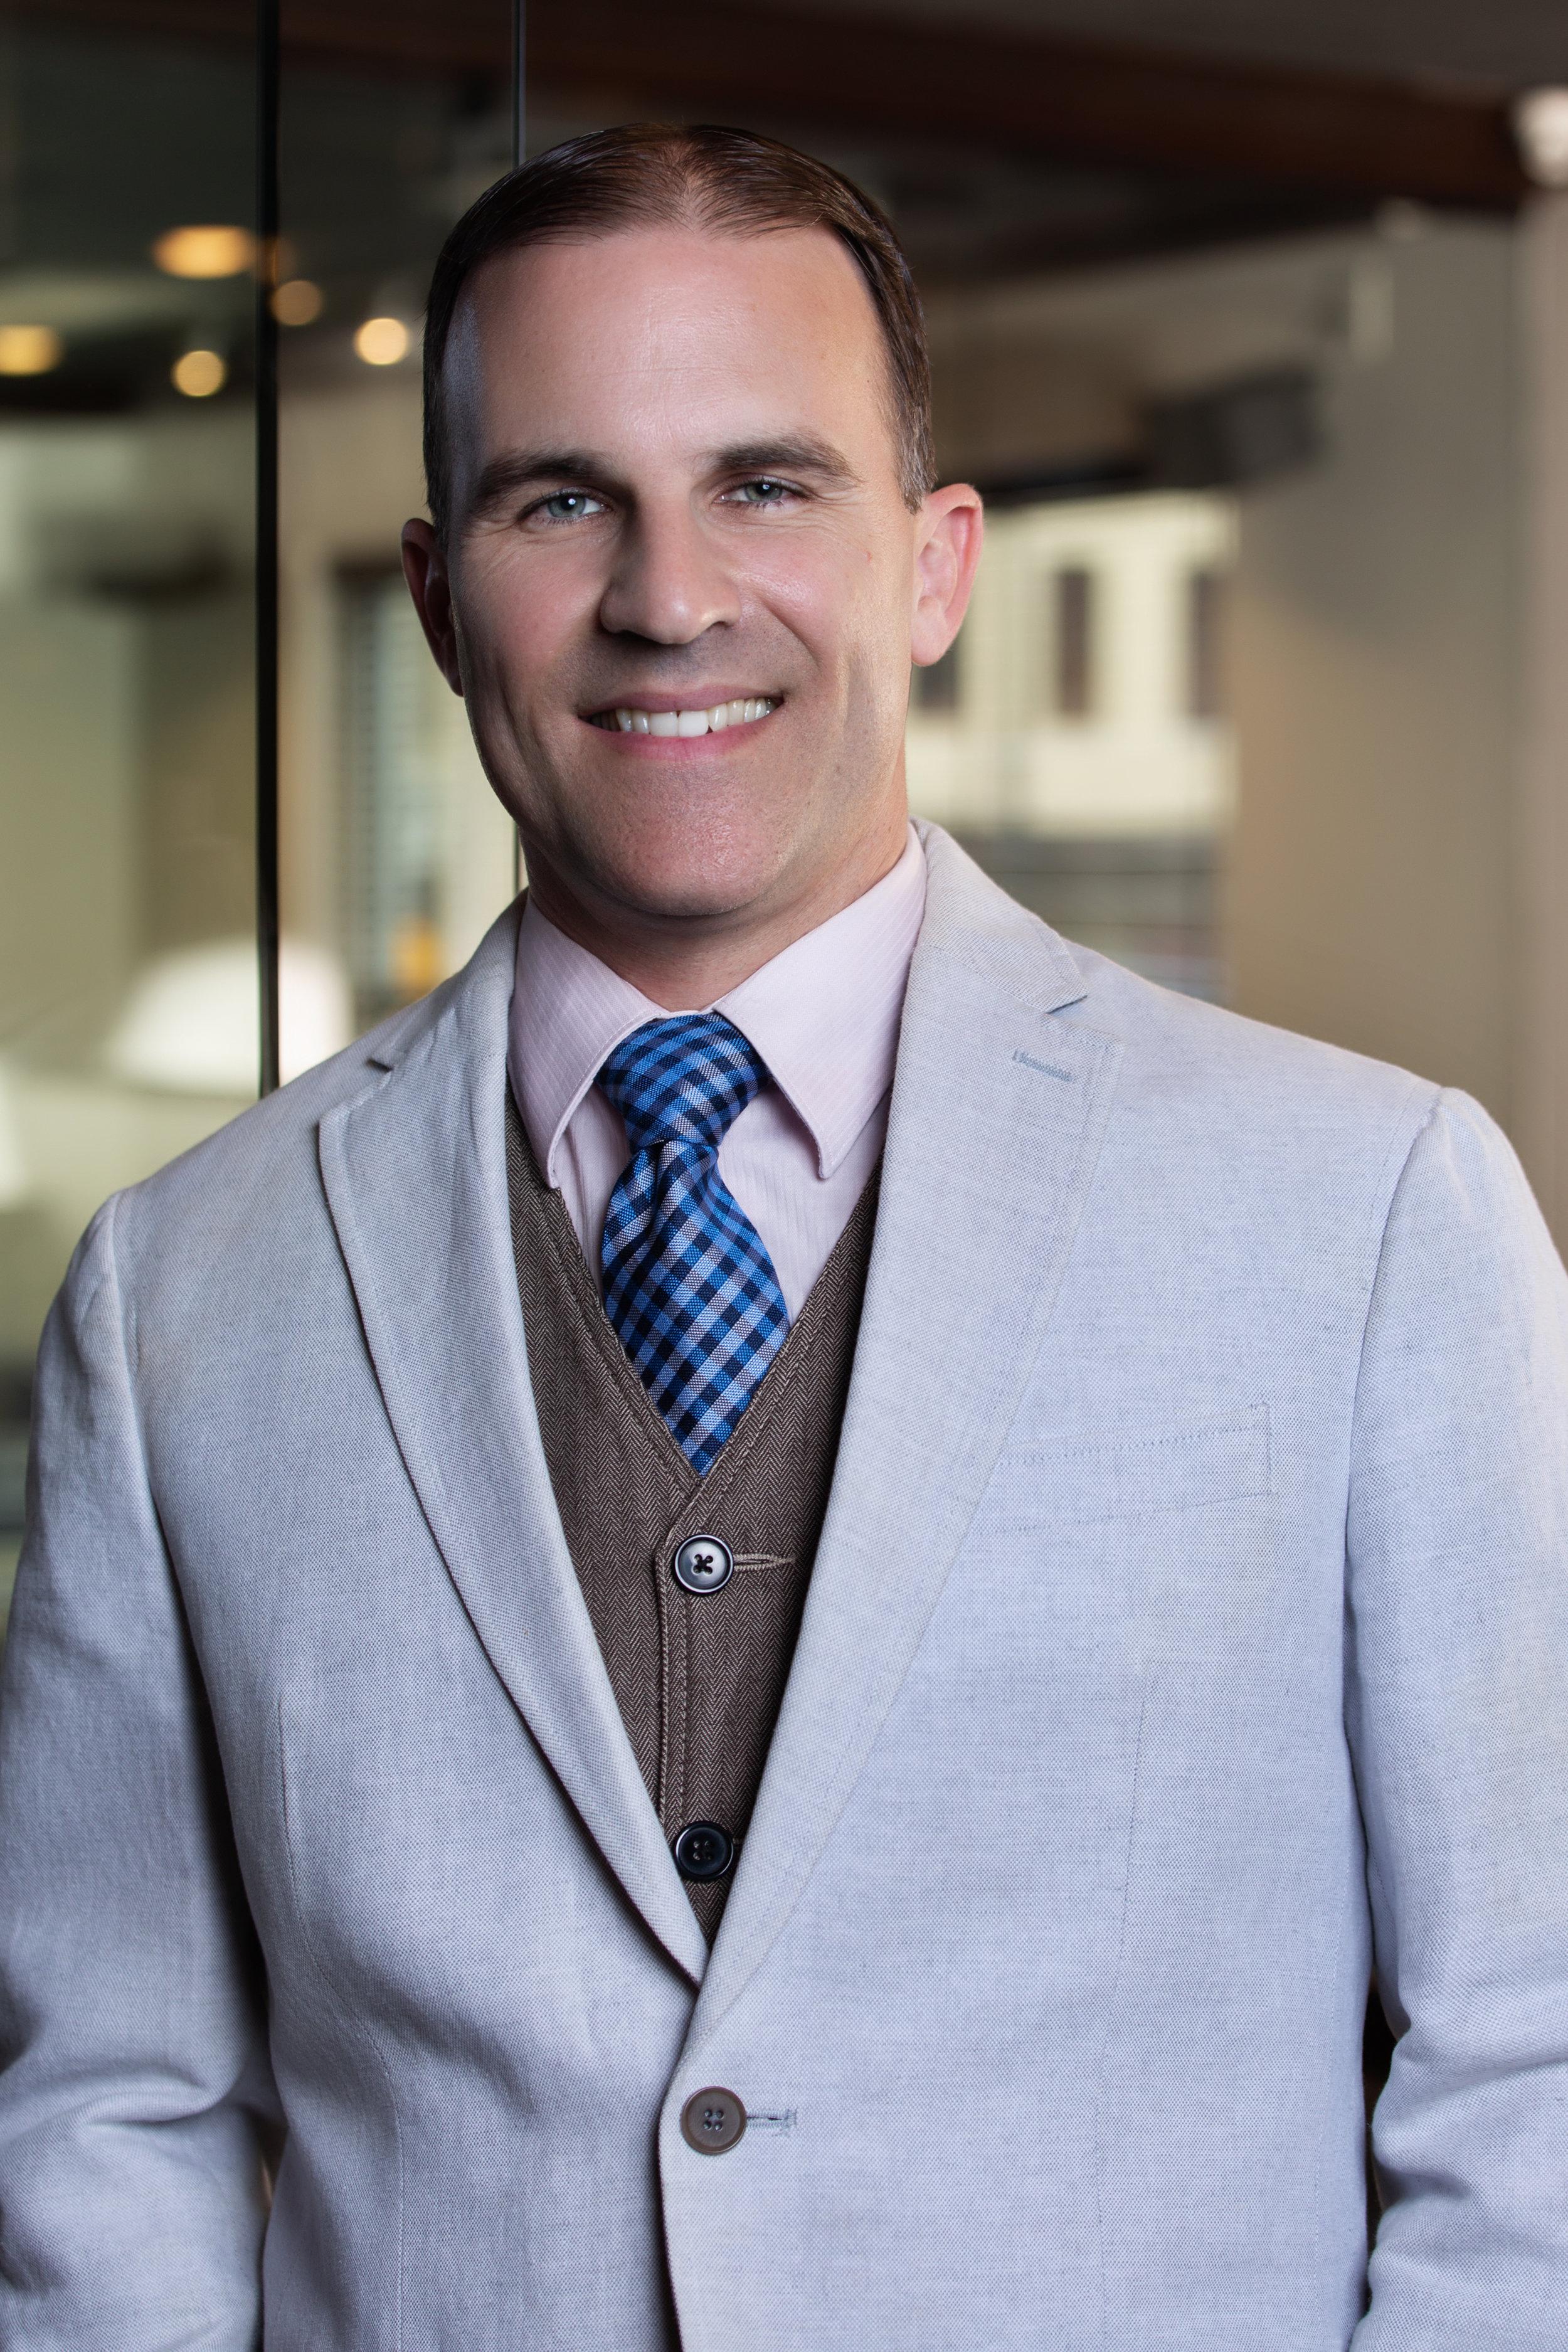 Justin Freer, Principal Conductor & CineConcerts Producer